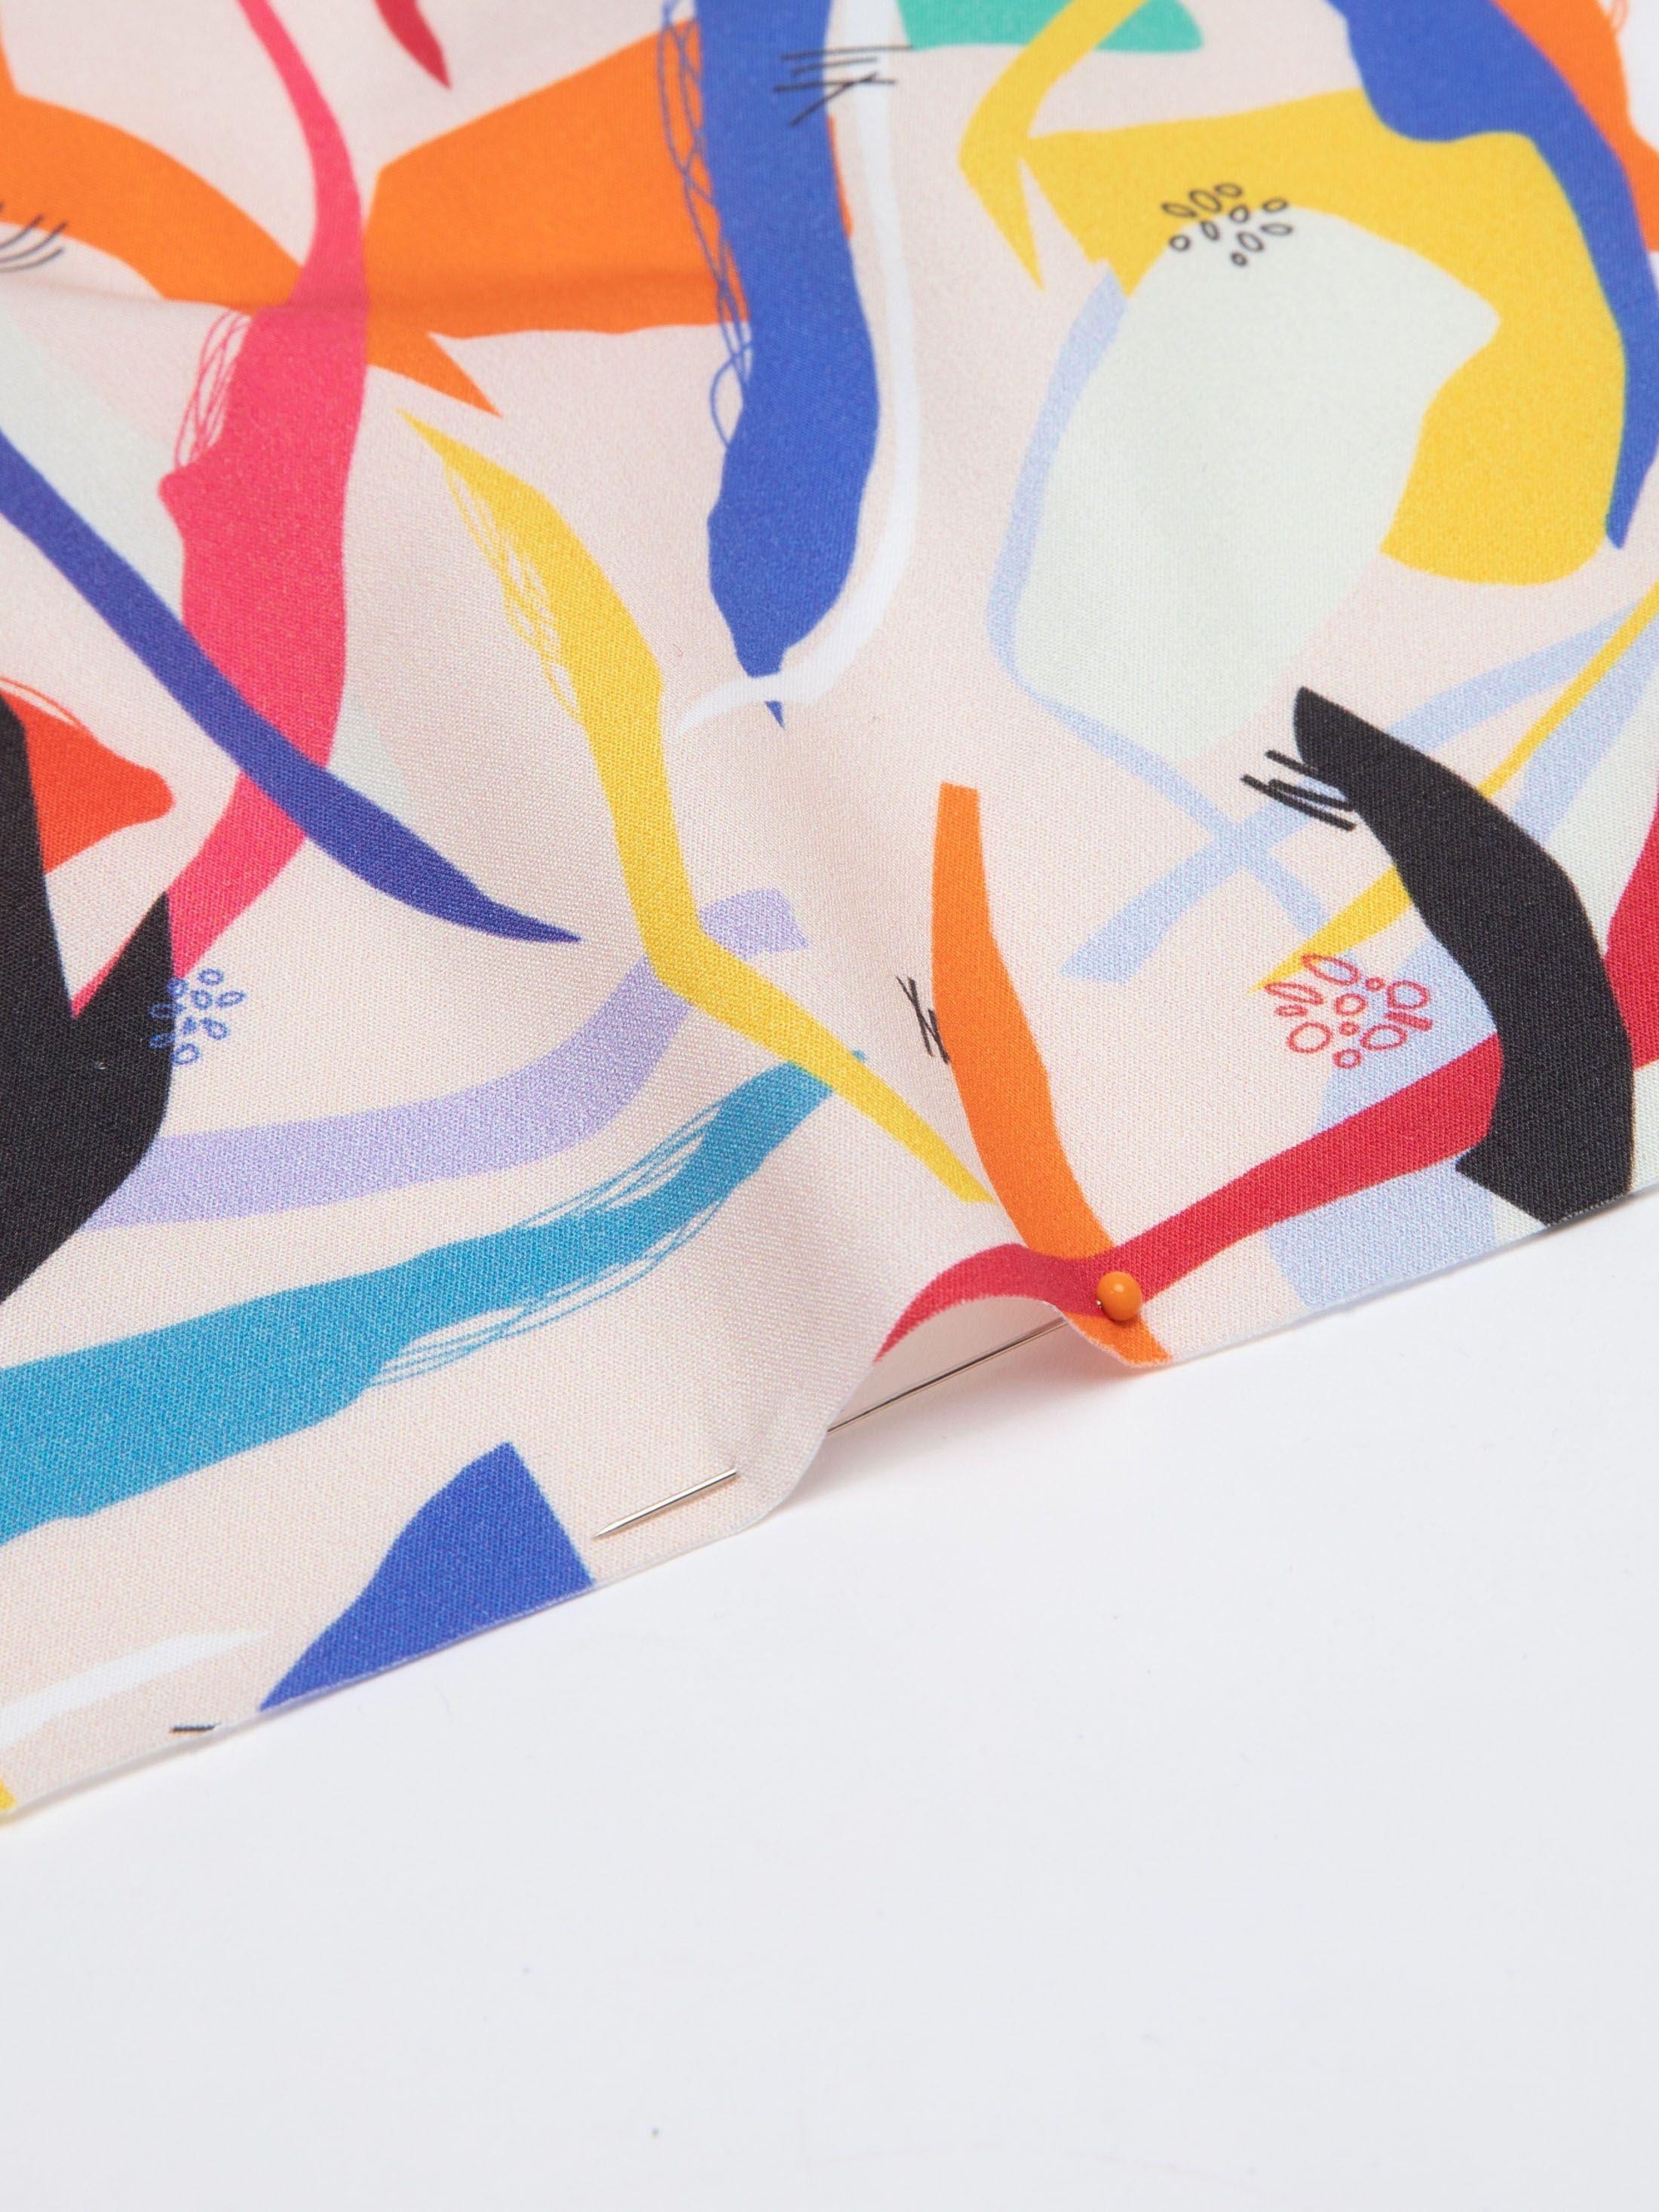 printed organic cotton fabric